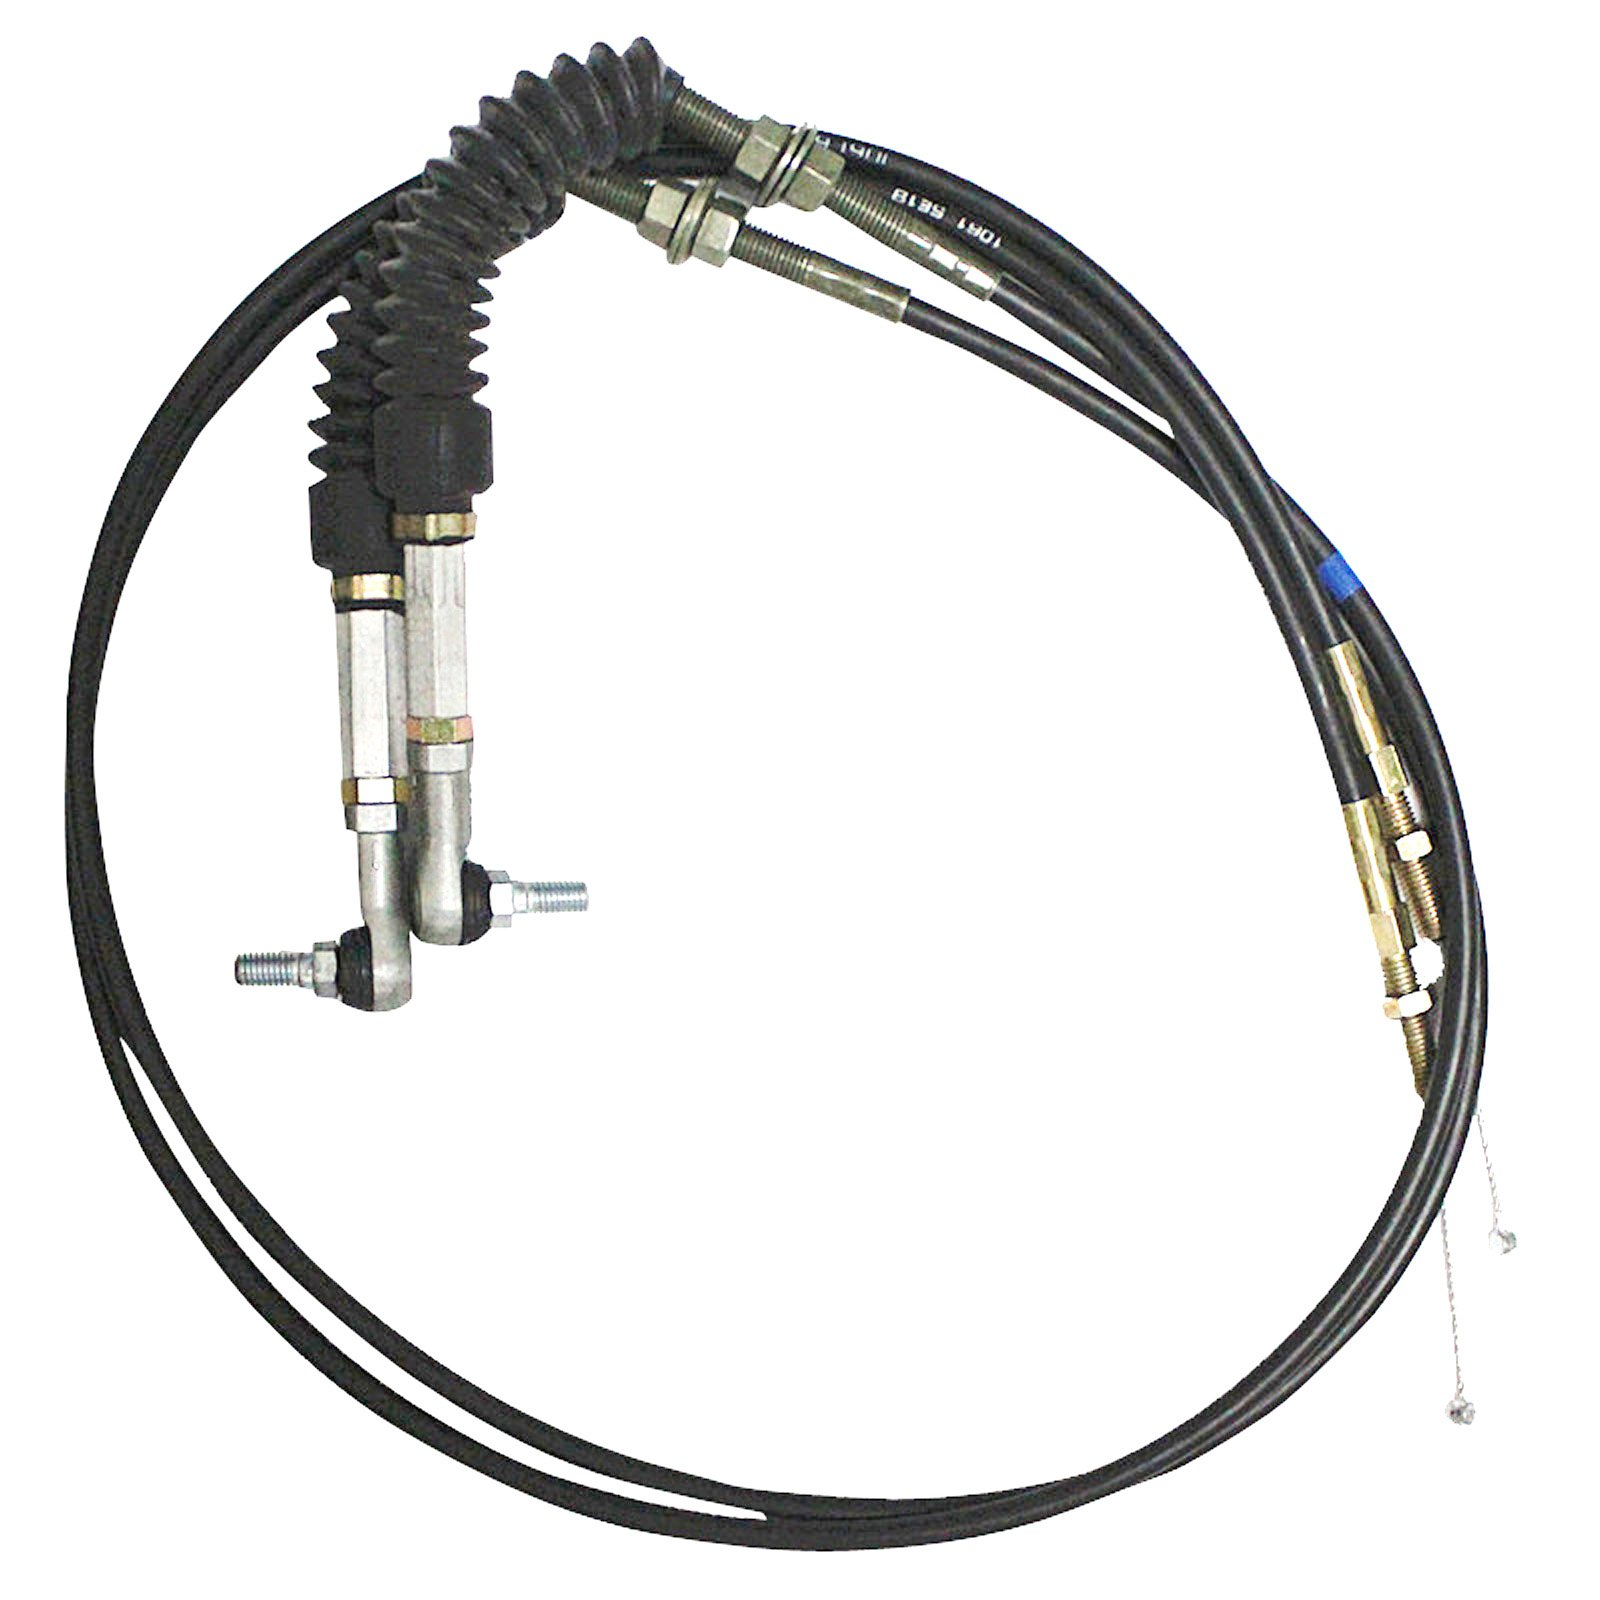 SINOCMP Double Cable for Caterpillar 312 E312 E312A Excavator Throttle Motor Parts 3 Month Warranty